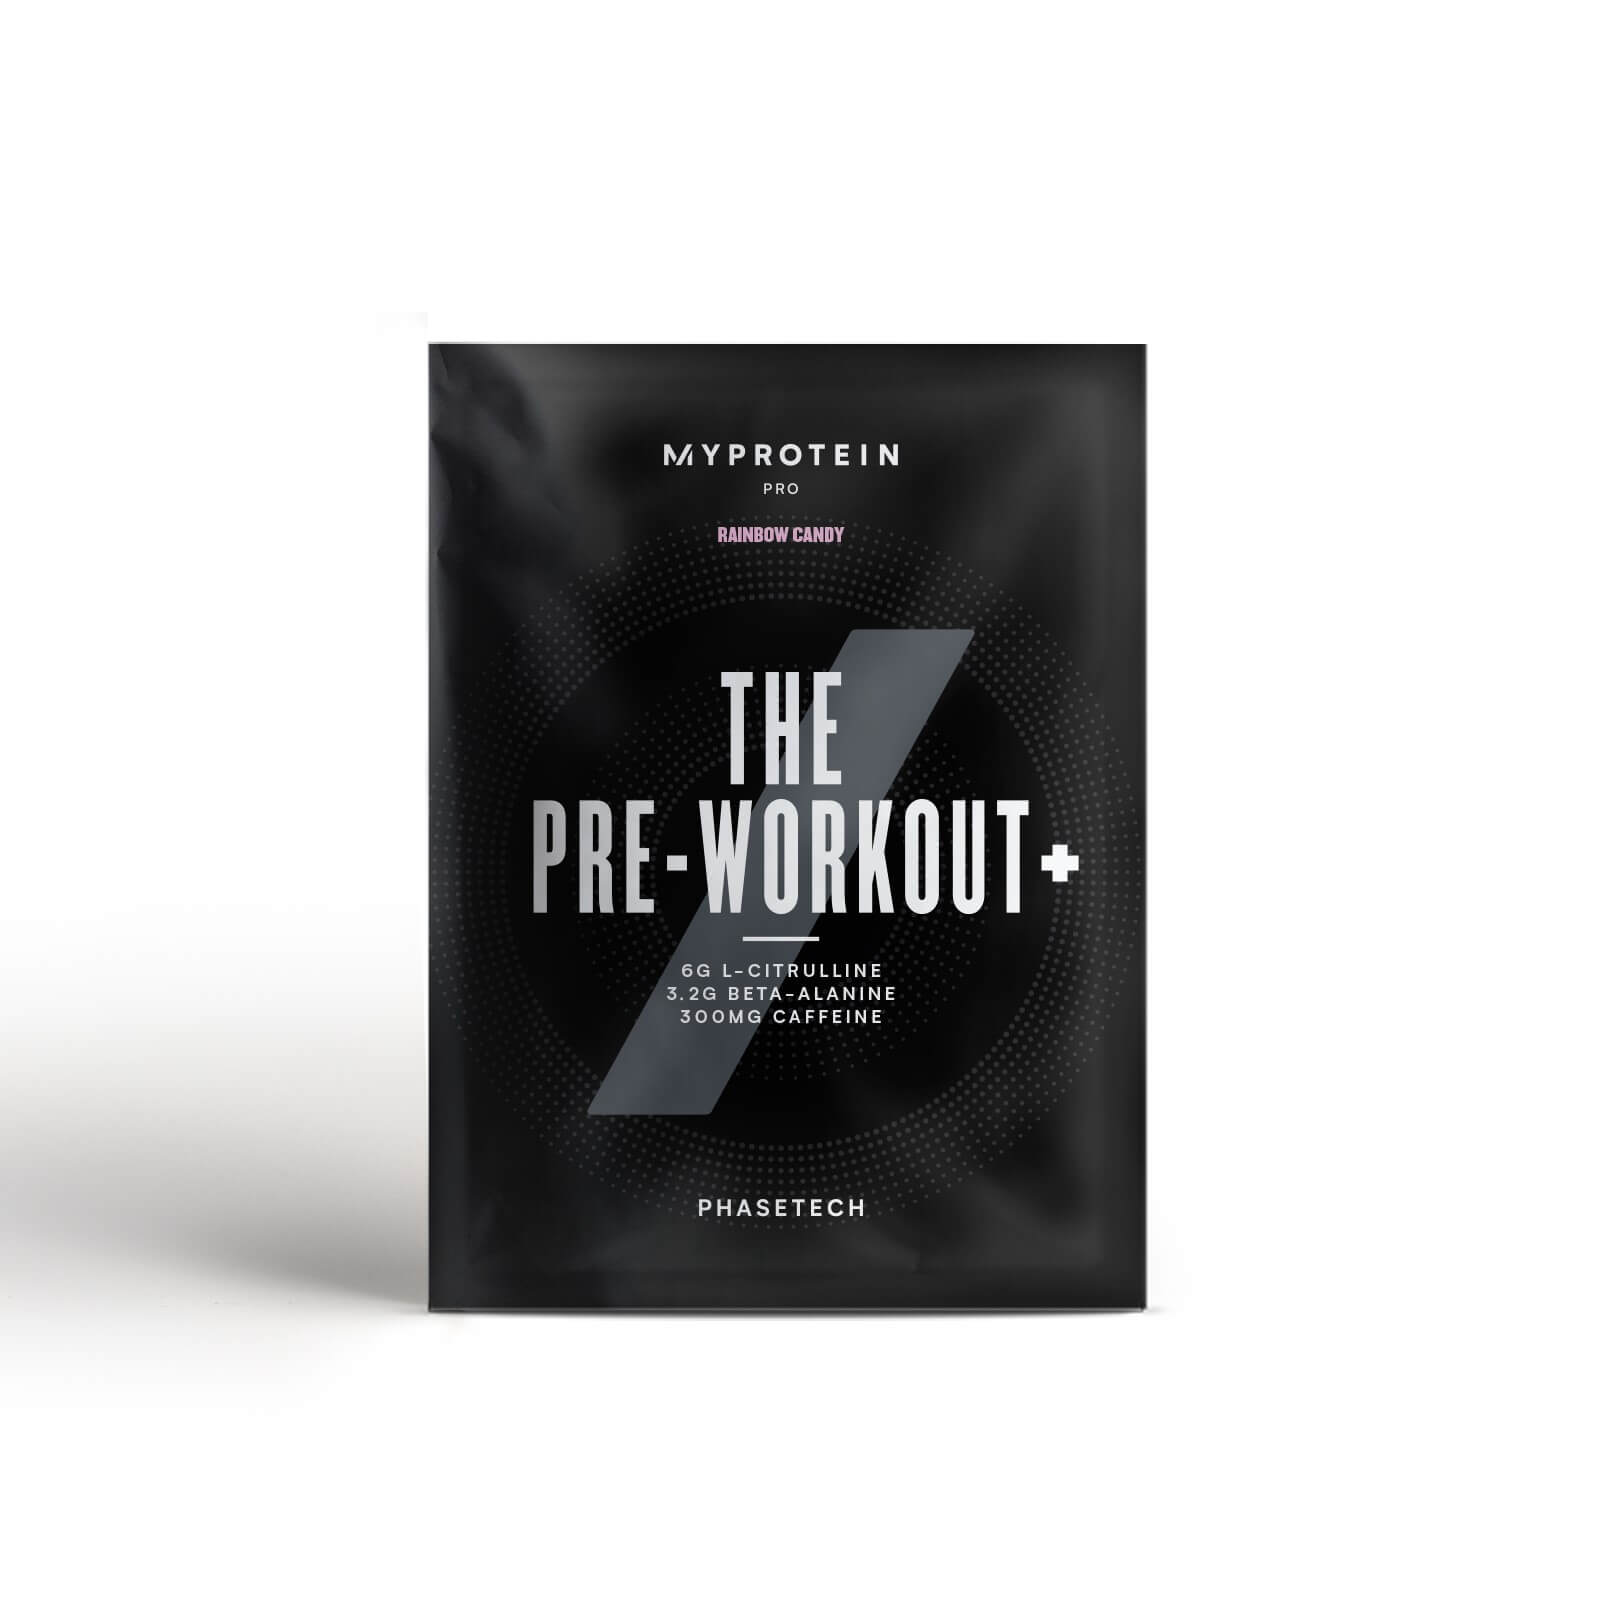 THE Pre-Workout+ (Échantillon) - Bonbons